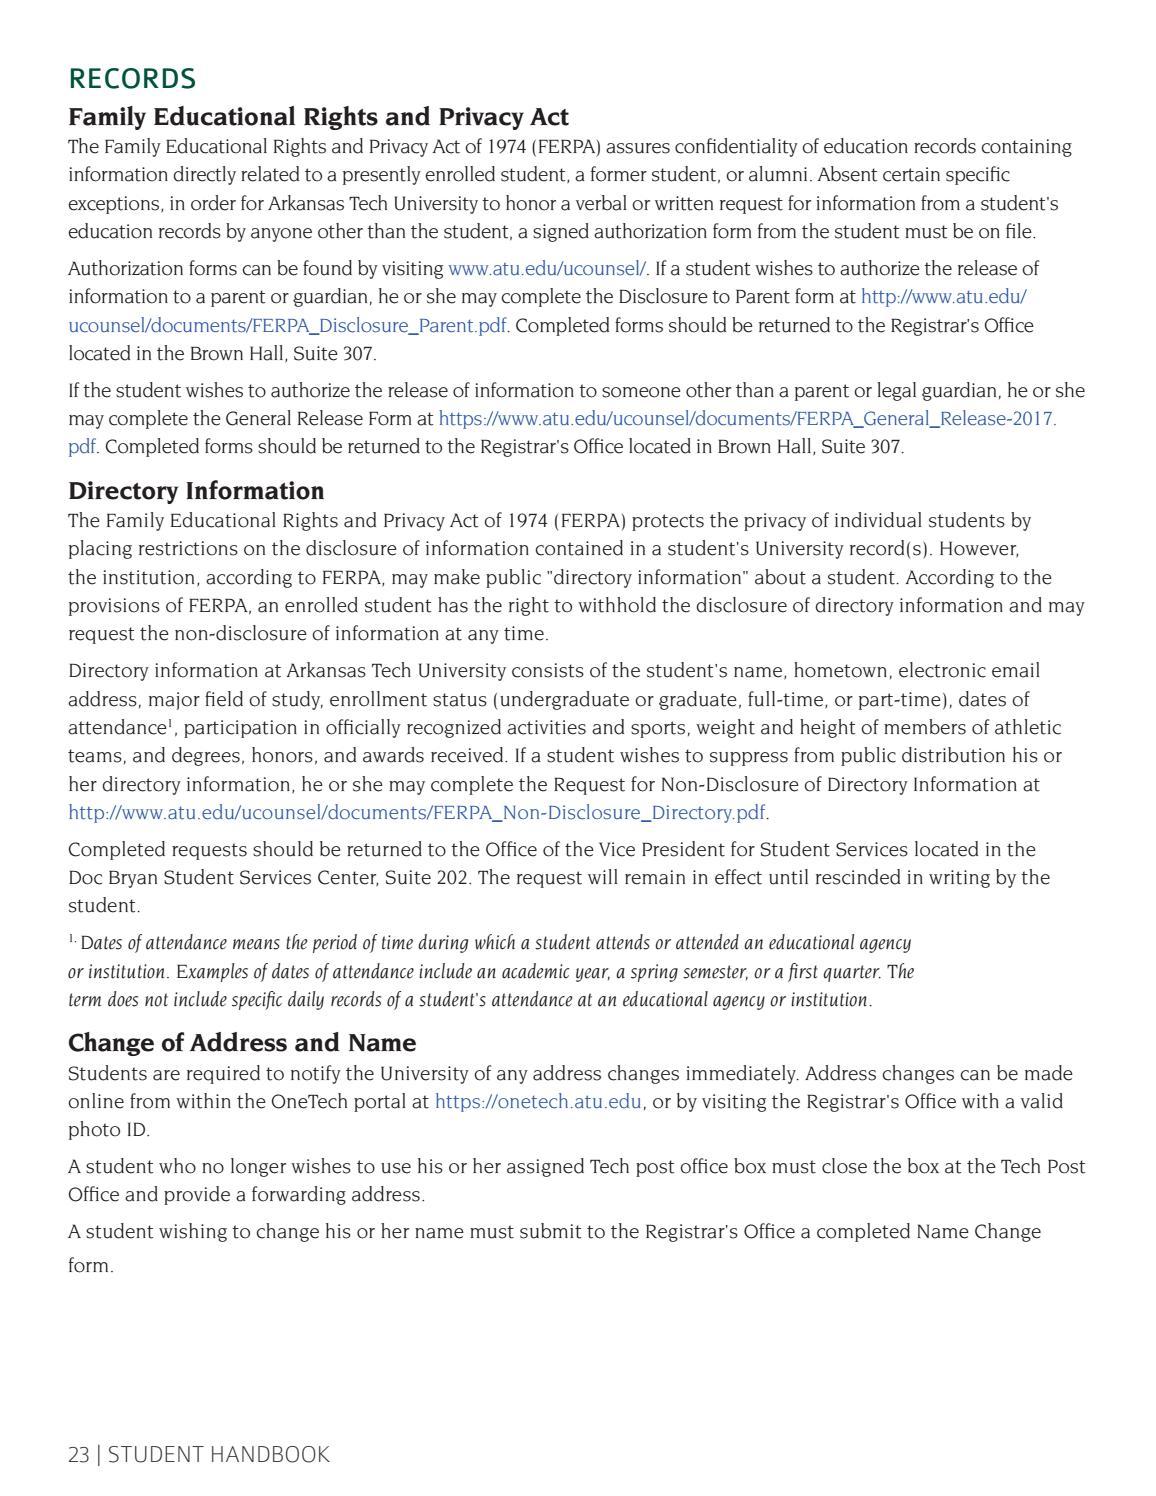 onetech.atu.edu